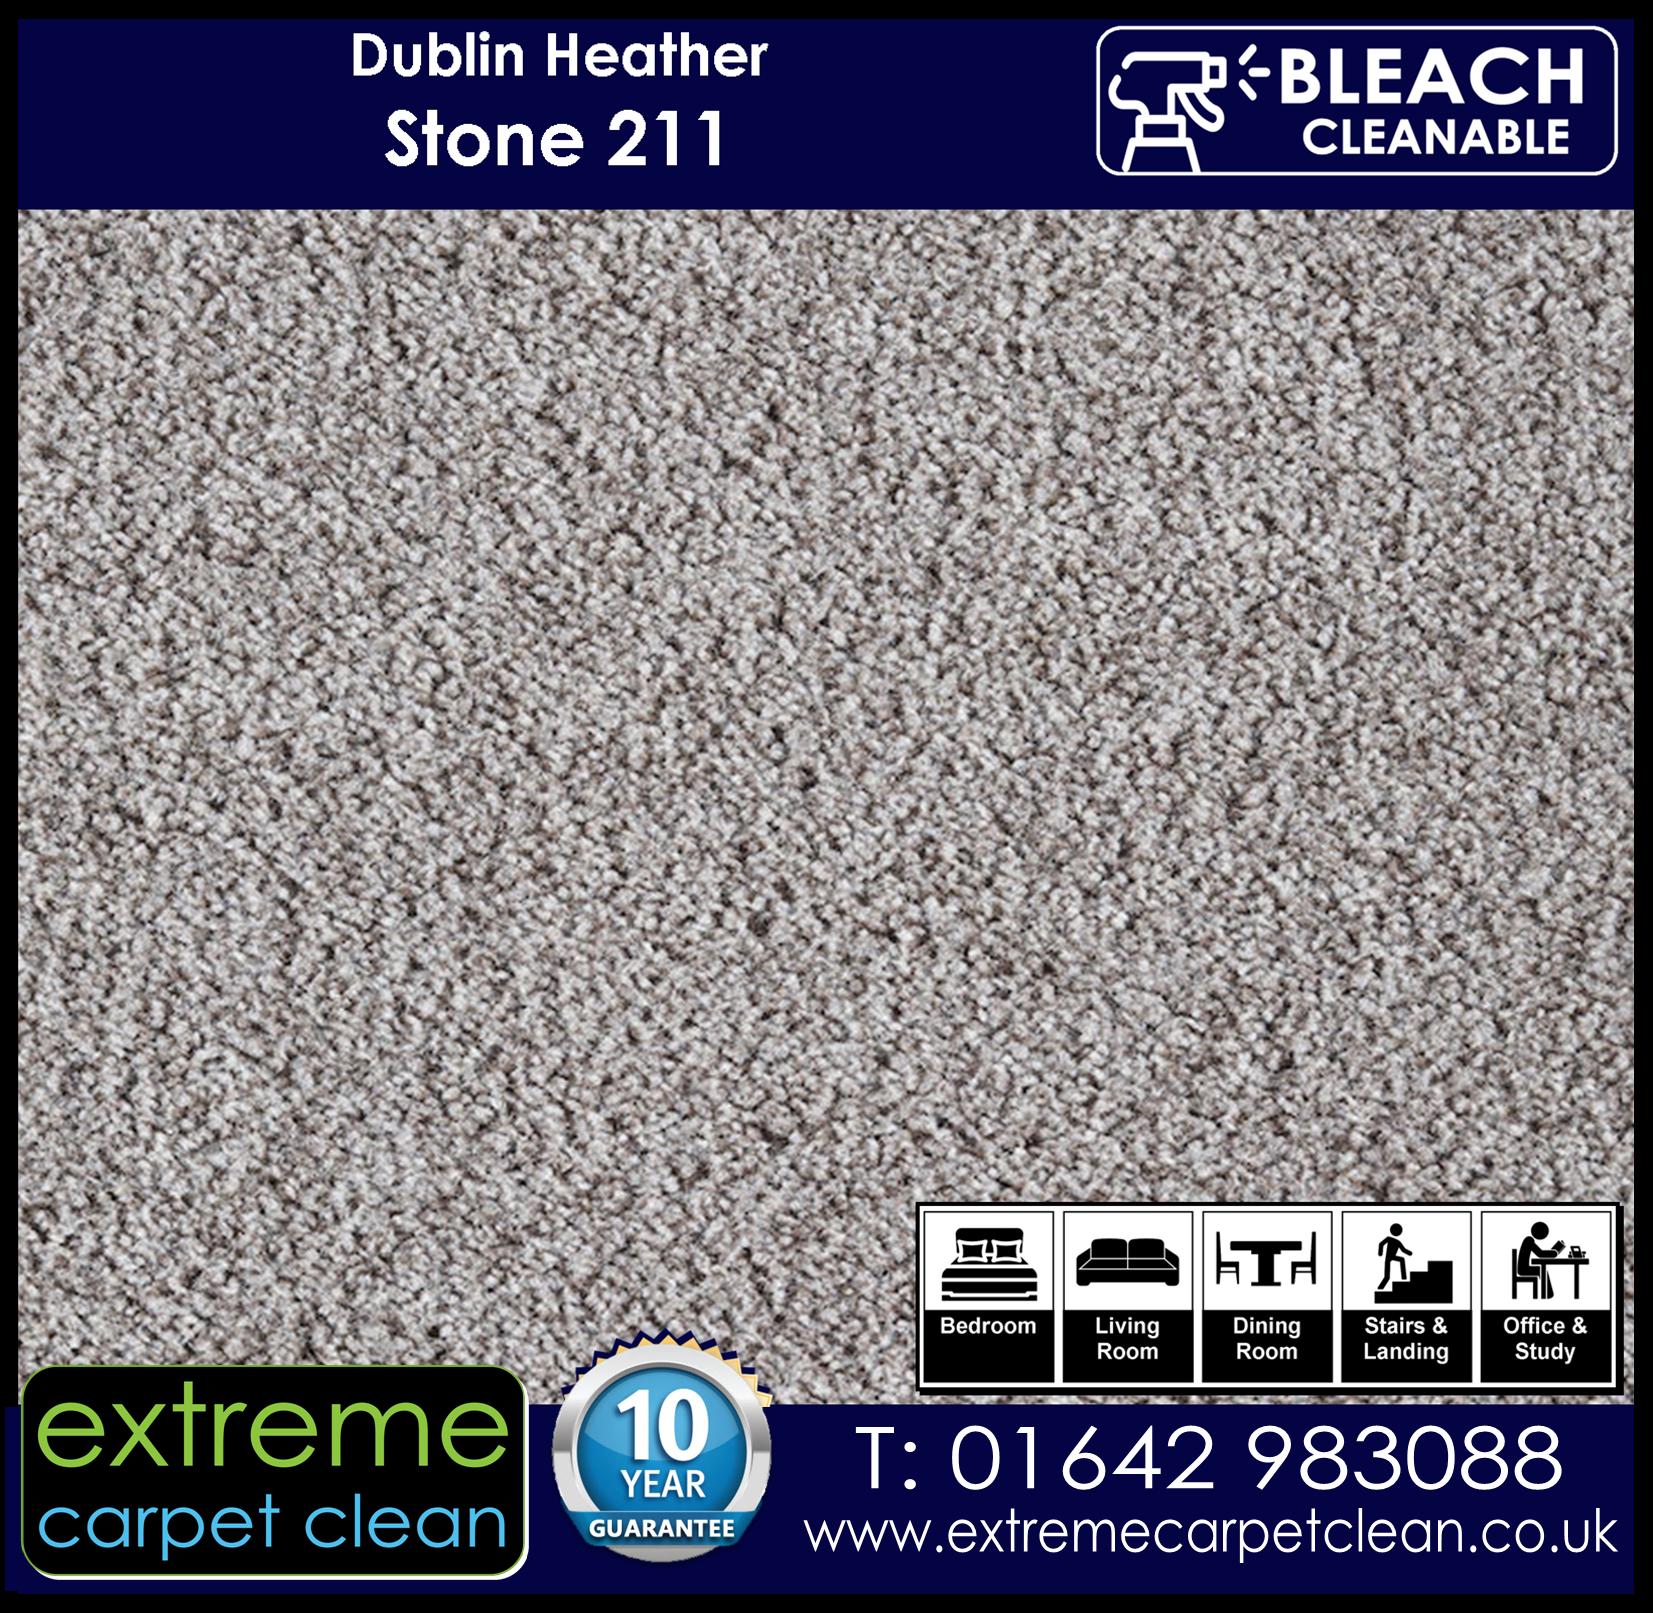 Dublin Heather Carpet Range. Stone 211 Extreme Carpet Clean